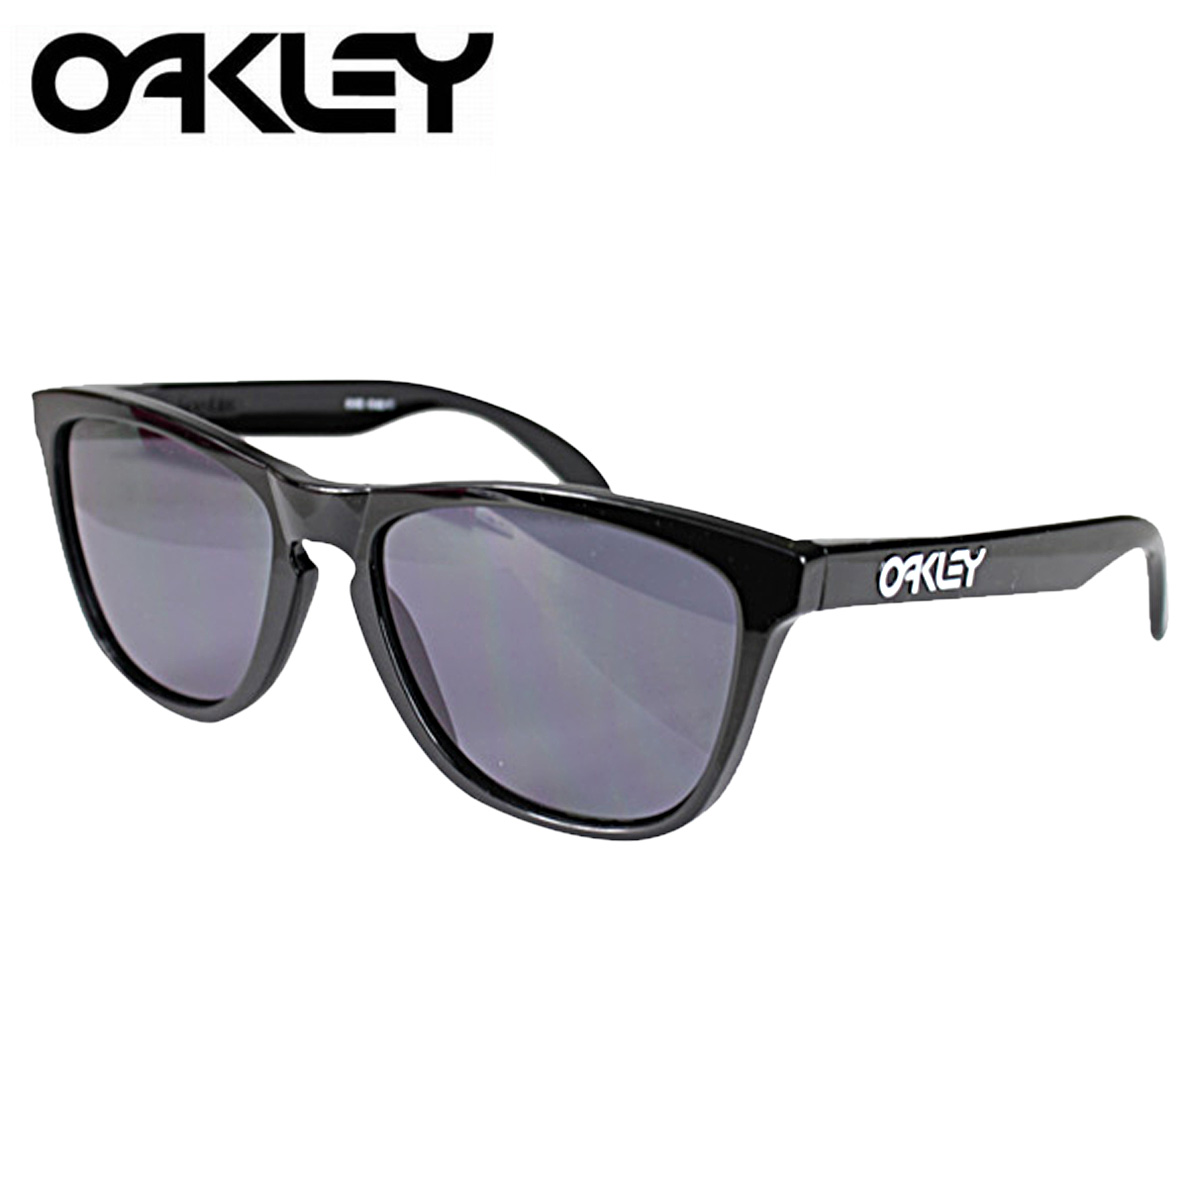 e7c85b590a ALLSPORTS  Oakley Oakley Sunglasses Frogskins frog skin mens Womens glasses  24-306 black x grey unisex  2   10 back in stock   regular